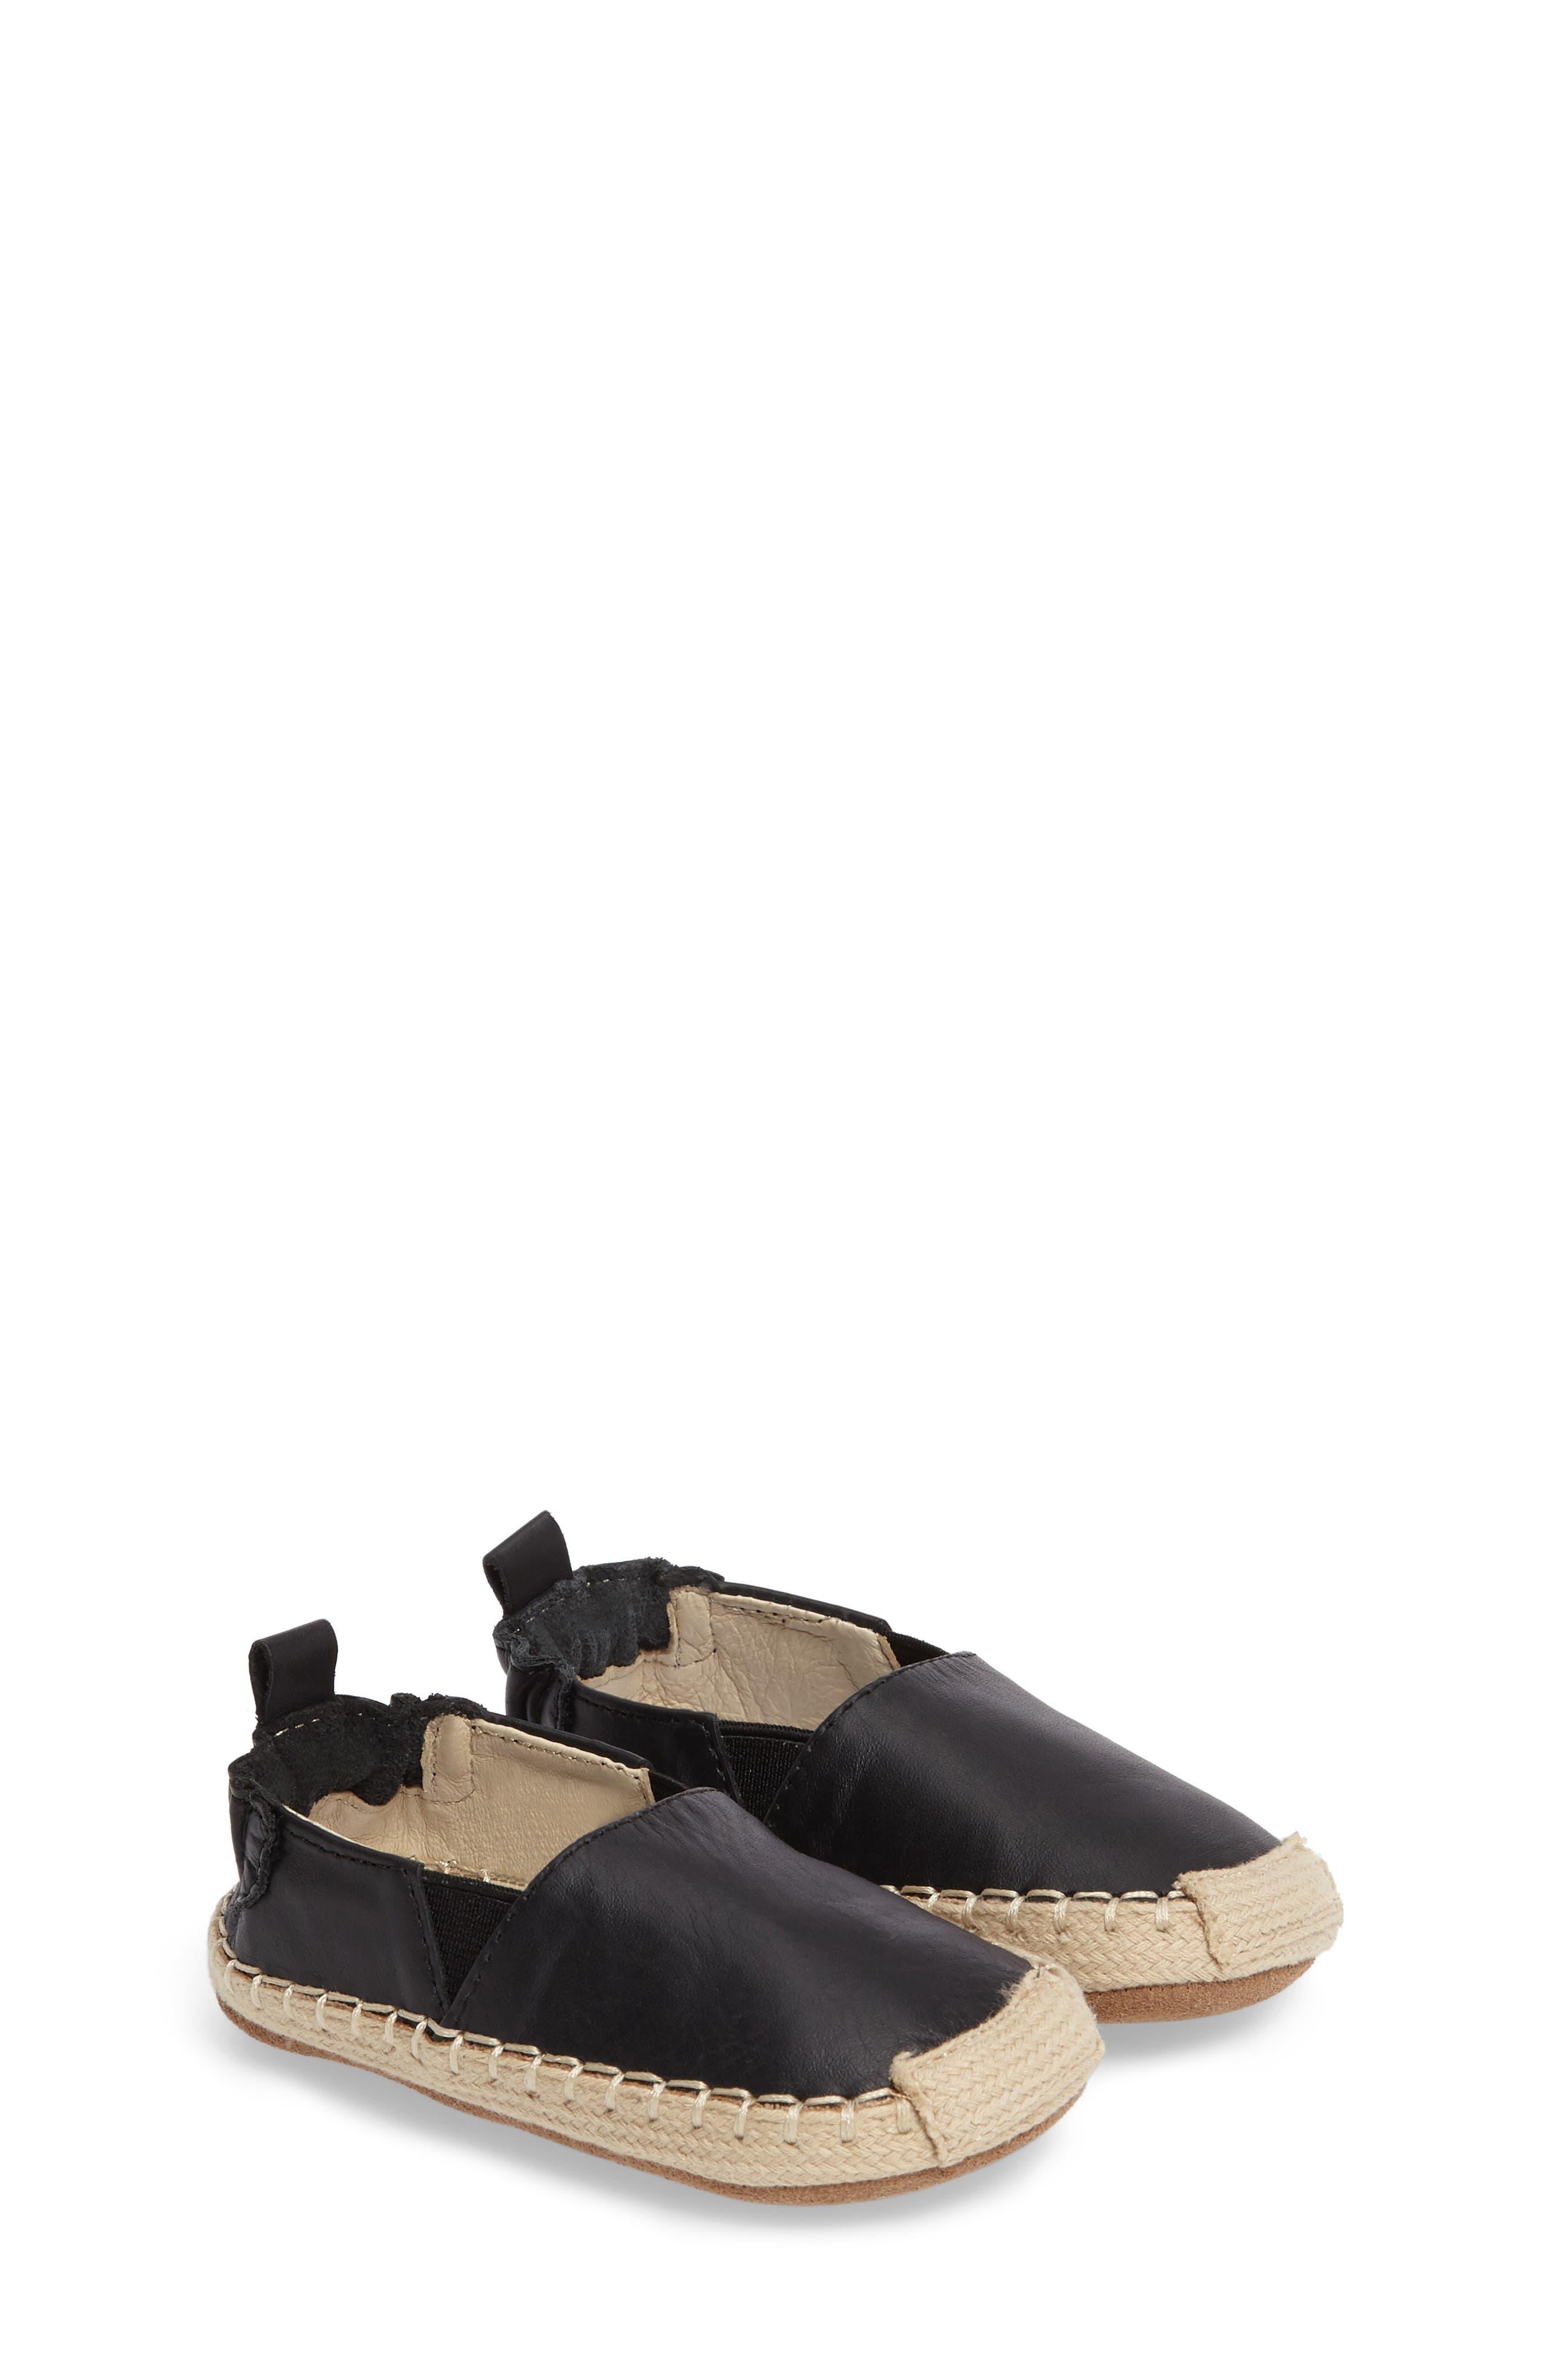 Ellie Crib Shoe,                             Main thumbnail 1, color,                             Black Leather